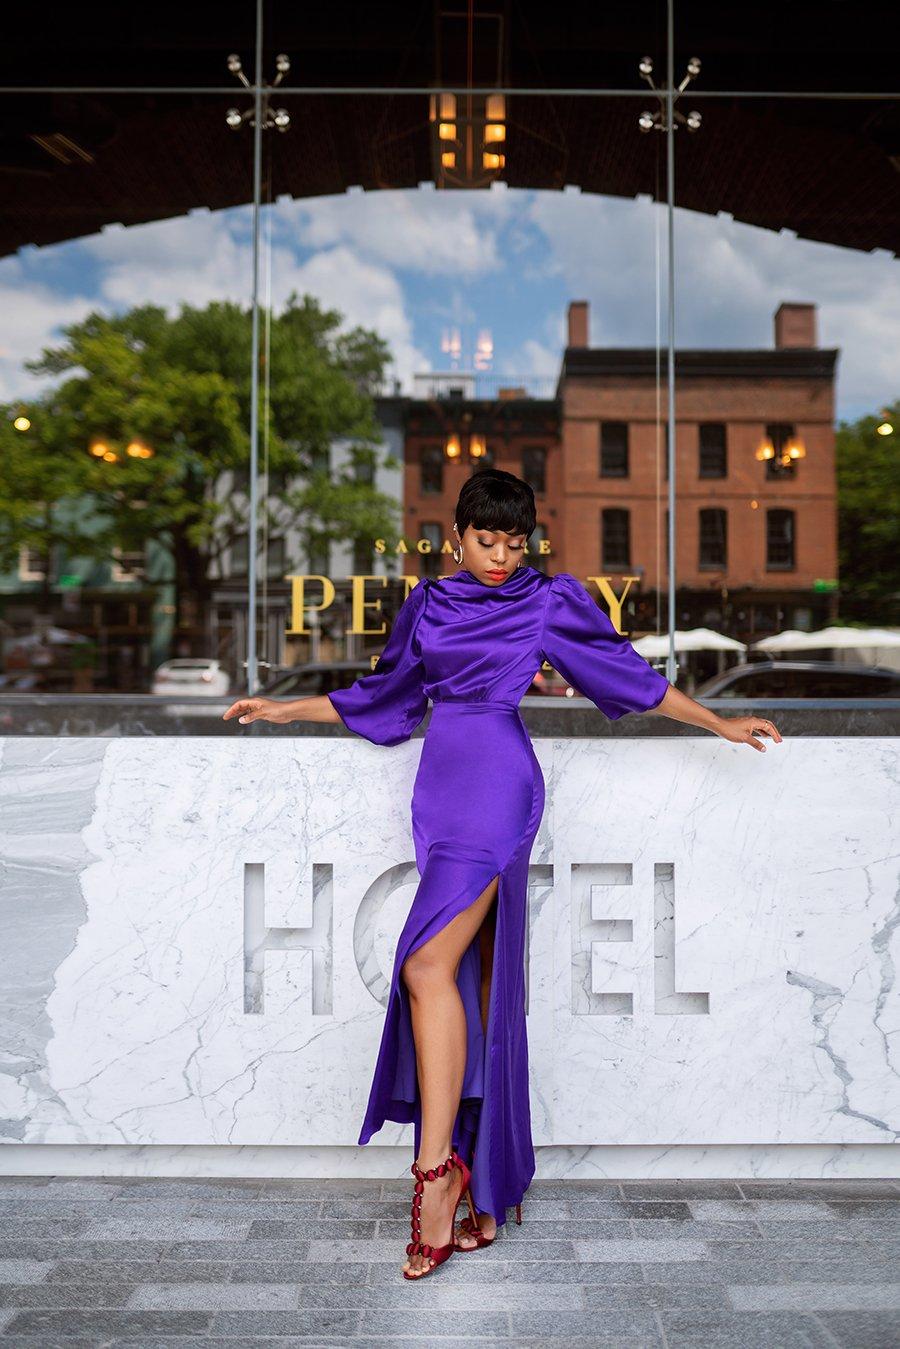 stella-adewunmi-of-jadore-fashion-blog-shares-turn-heads-in-this-summer-wedding-guest-dress